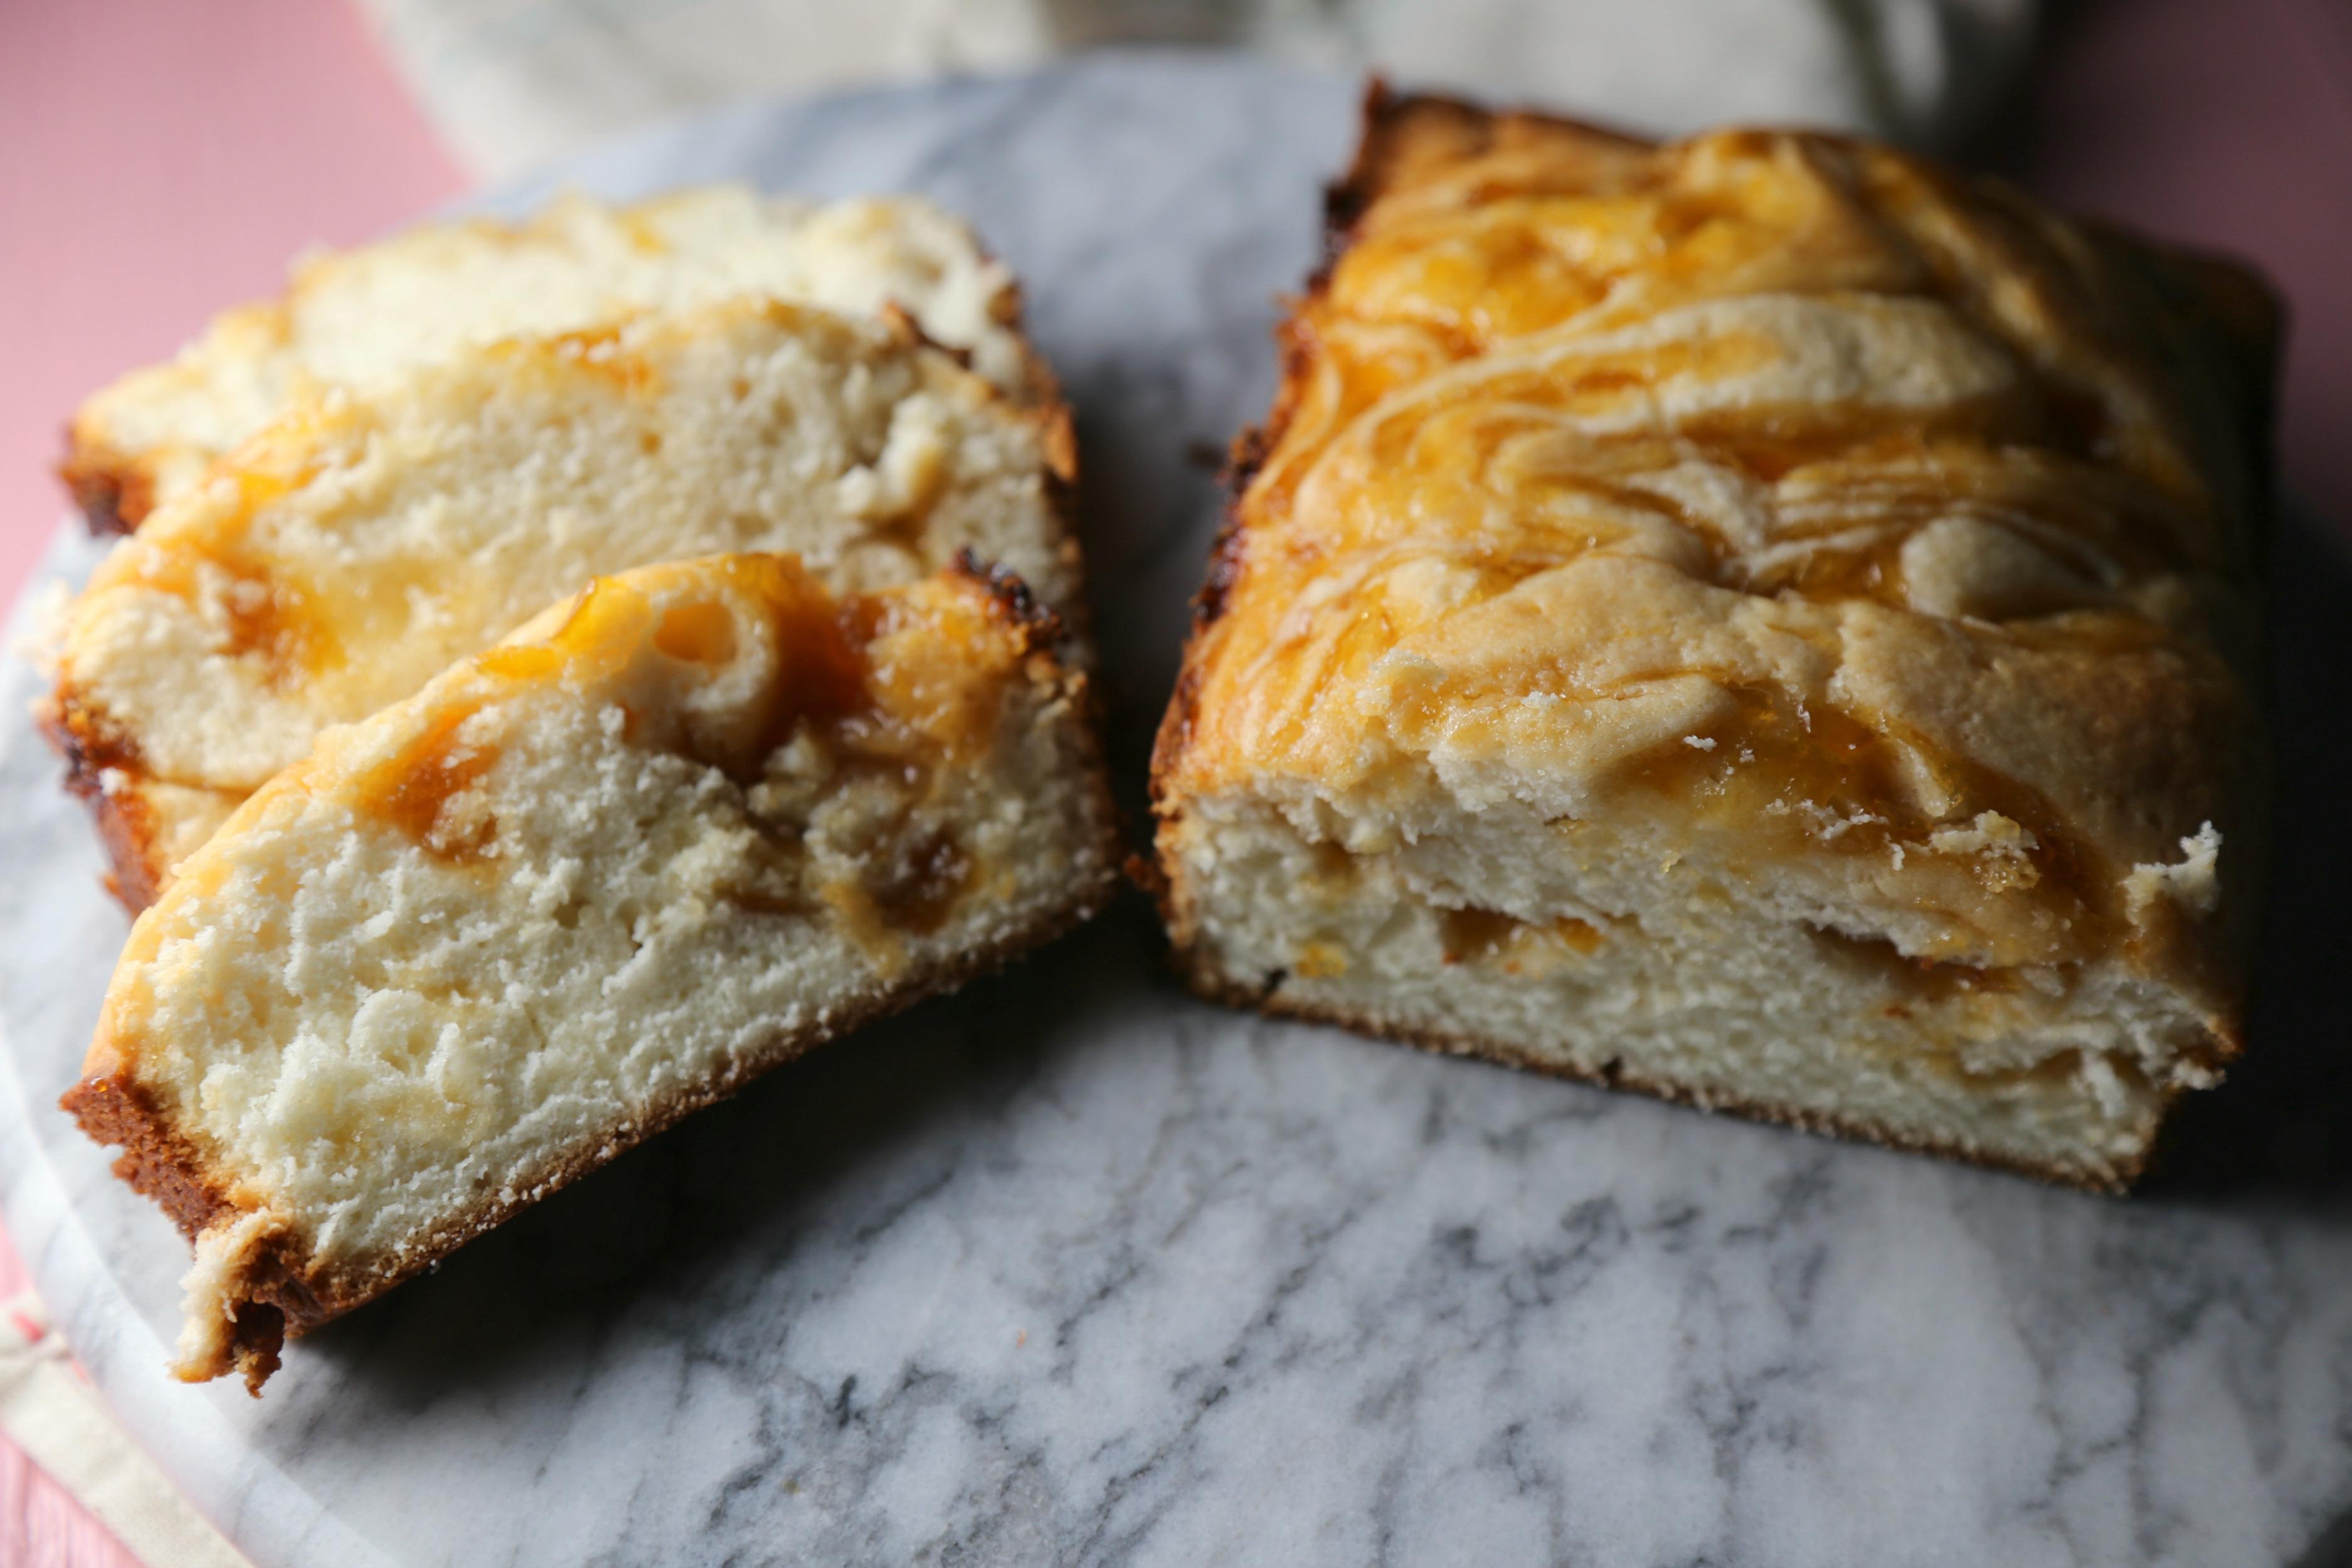 guava-pound-cake-vianneyrodriguez-sweetlifebake